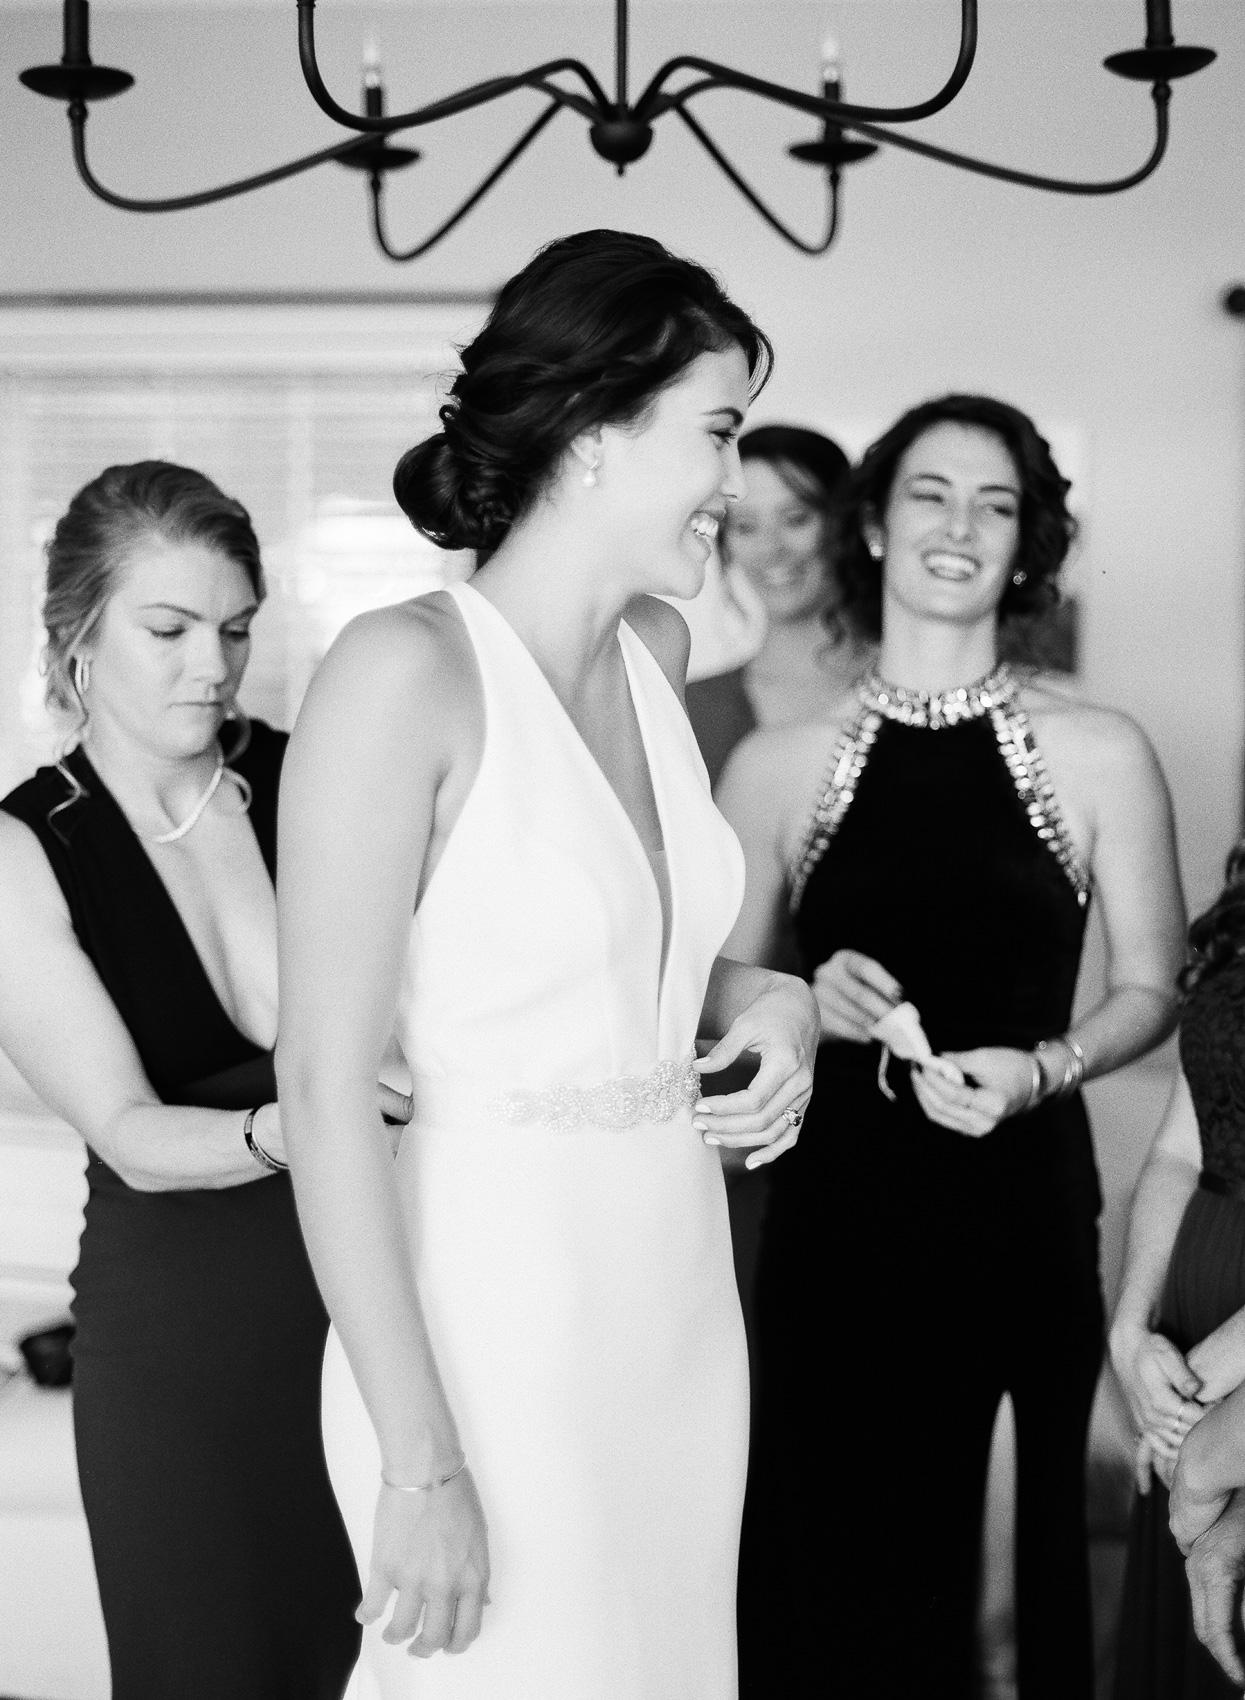 Asheville-Wedding-Venue-Film-Photographer-010.jpg